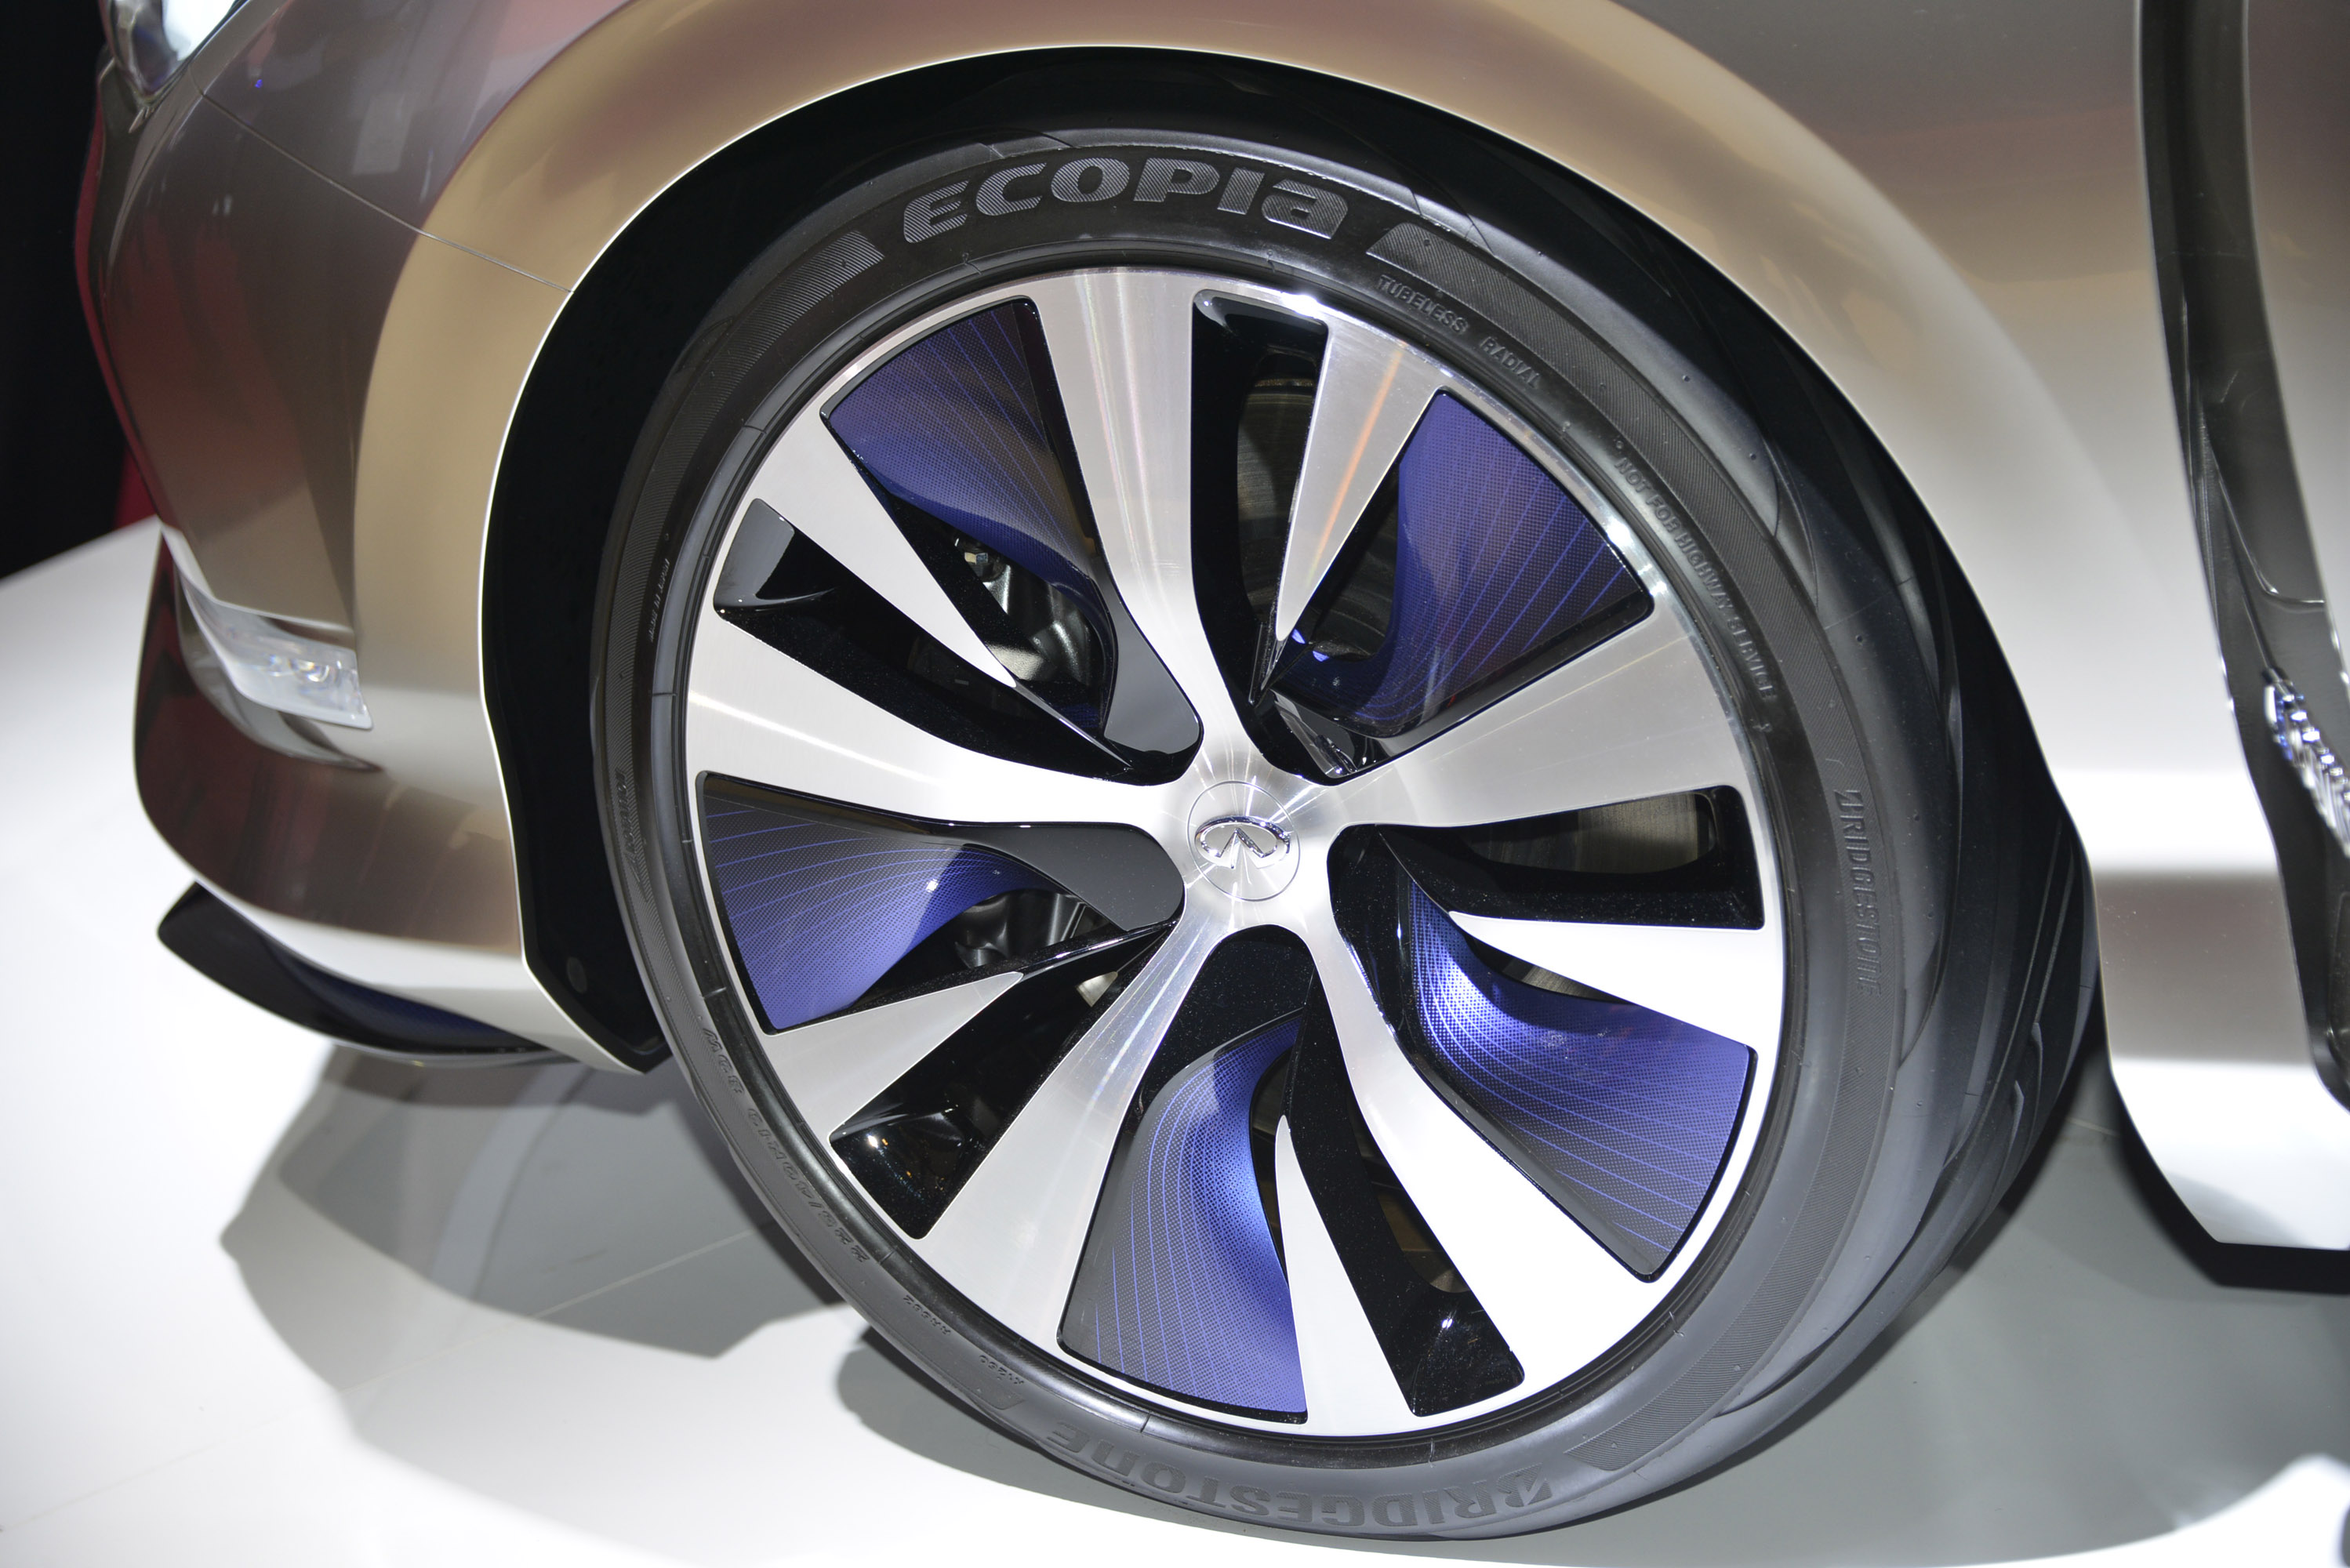 Dacia duster crossover concept unveiled at geneva motor show 2013 skoda yeti sochi special edition infiniti le concept paris 2012 vanachro Image collections